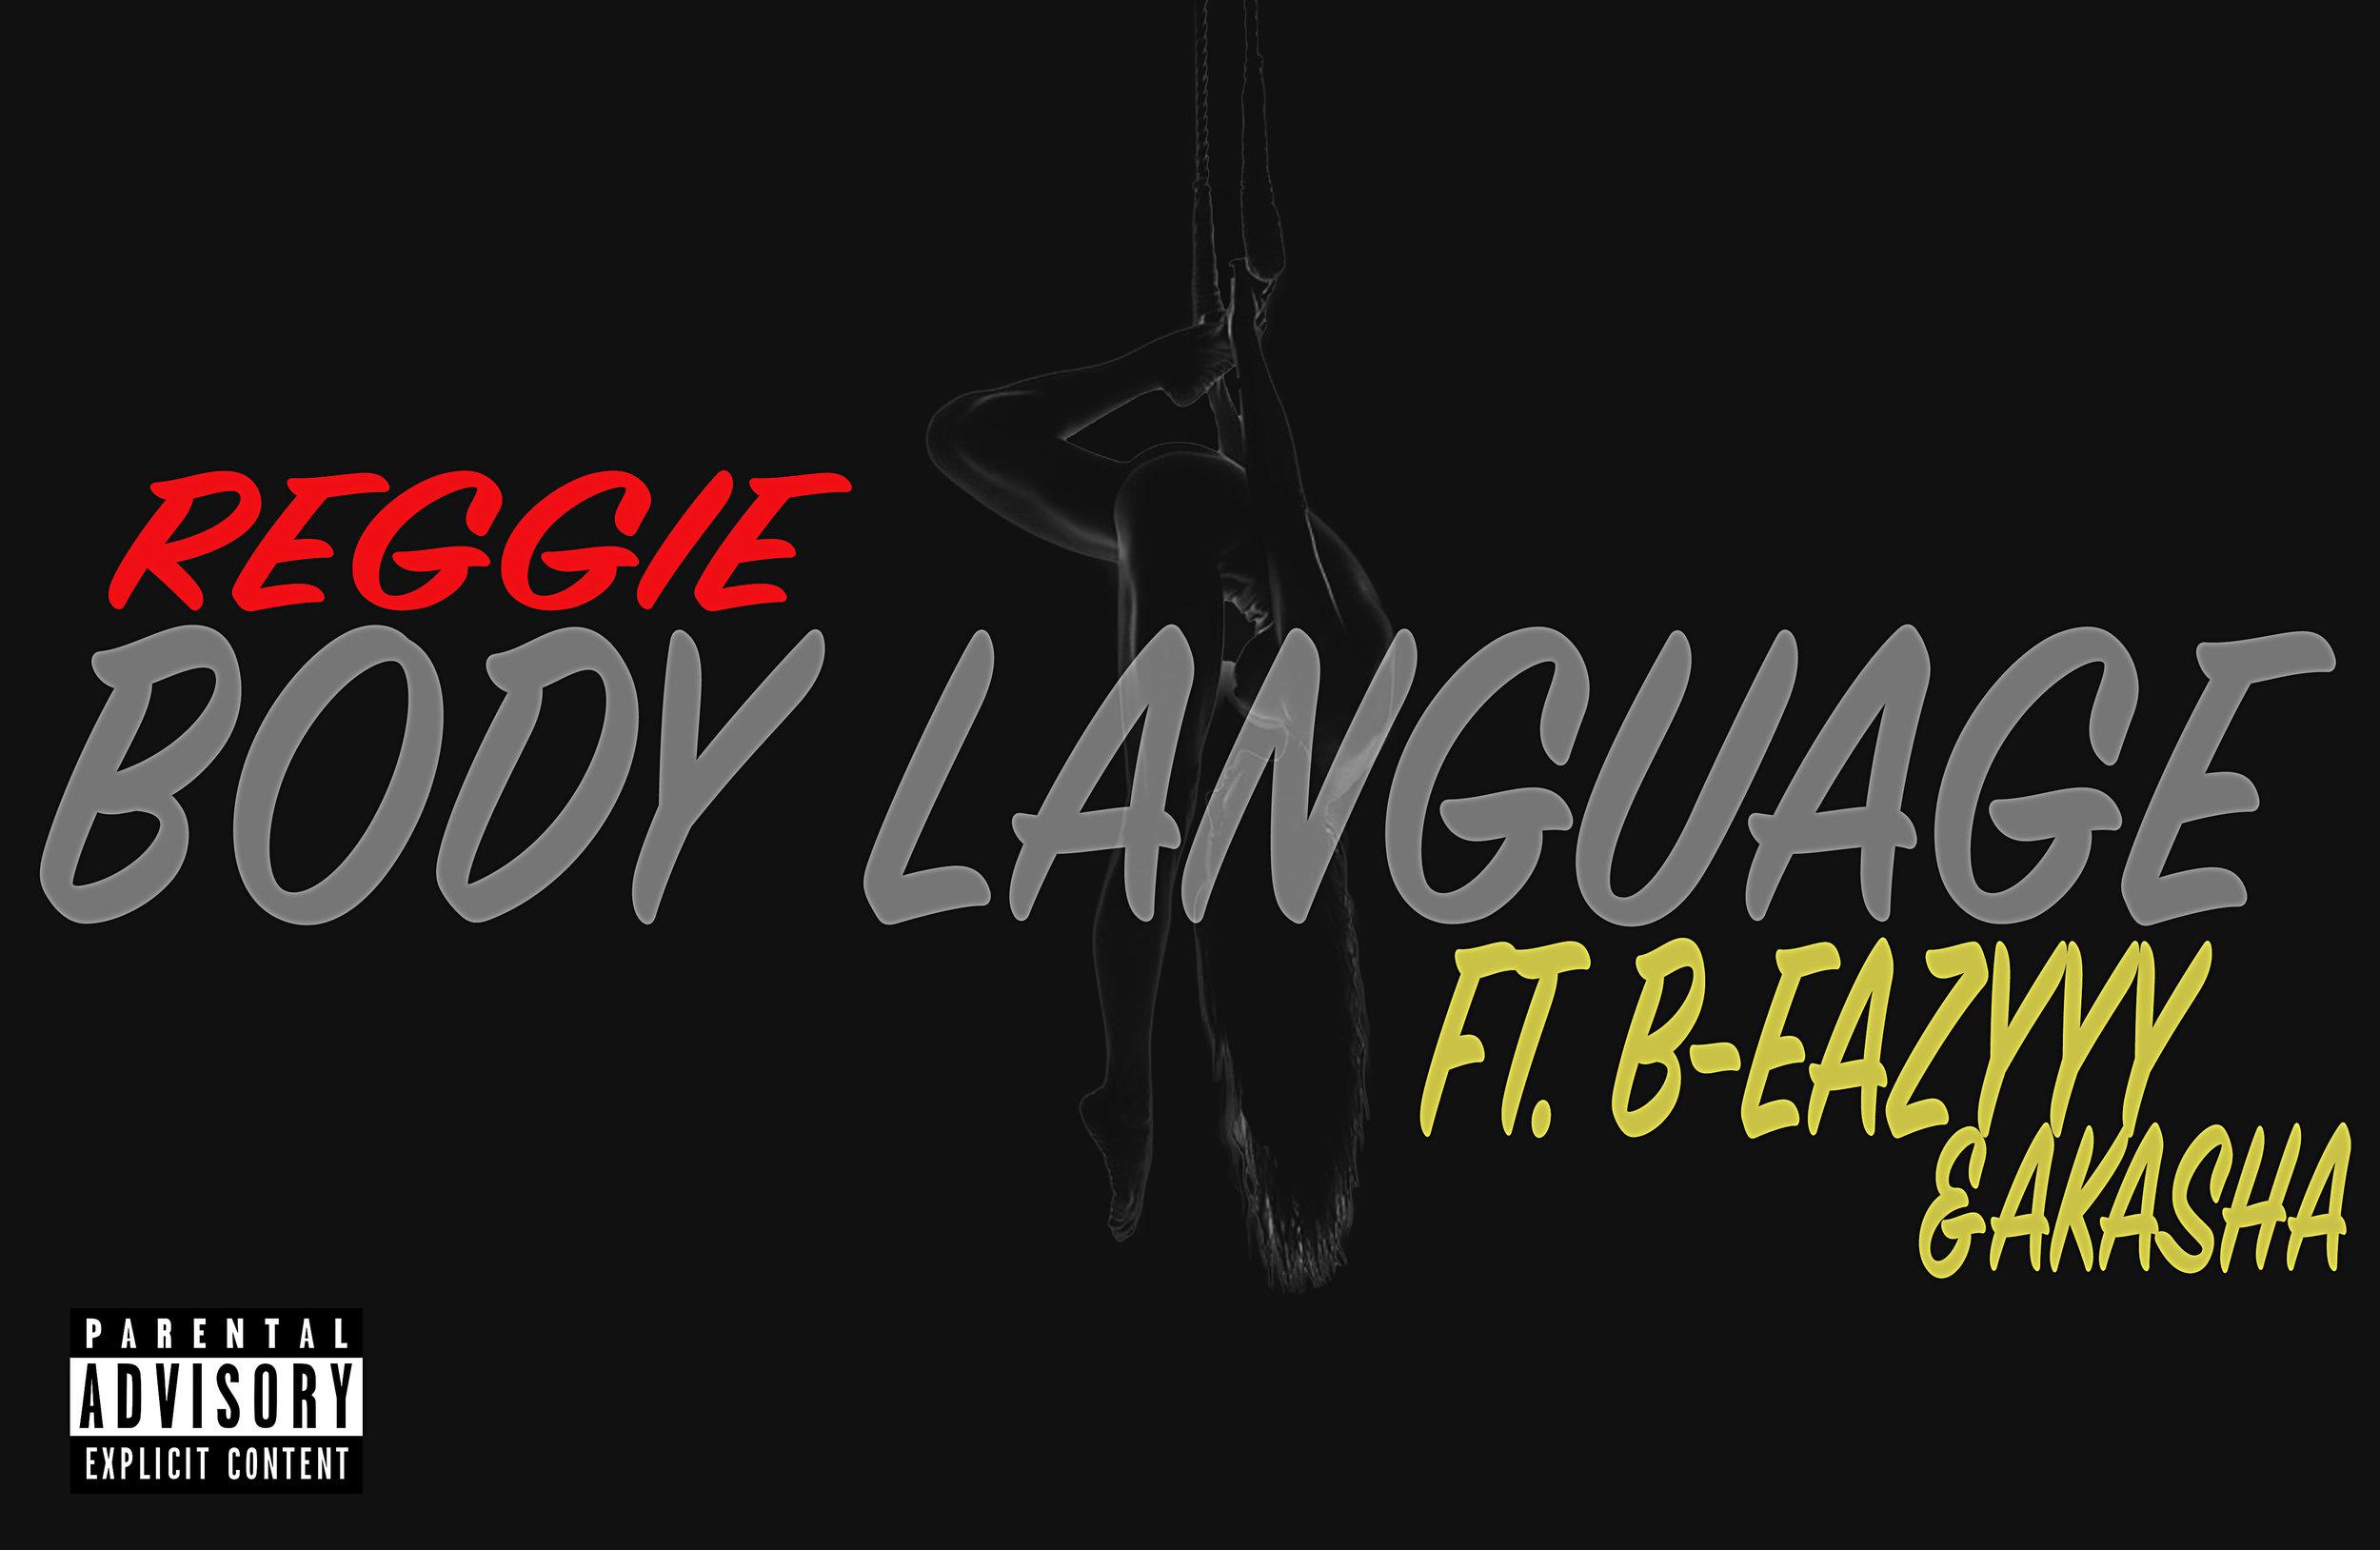 Second Single: Body Language    Featured: B-Eazyyy & Akasha    Released: November 28, 2014